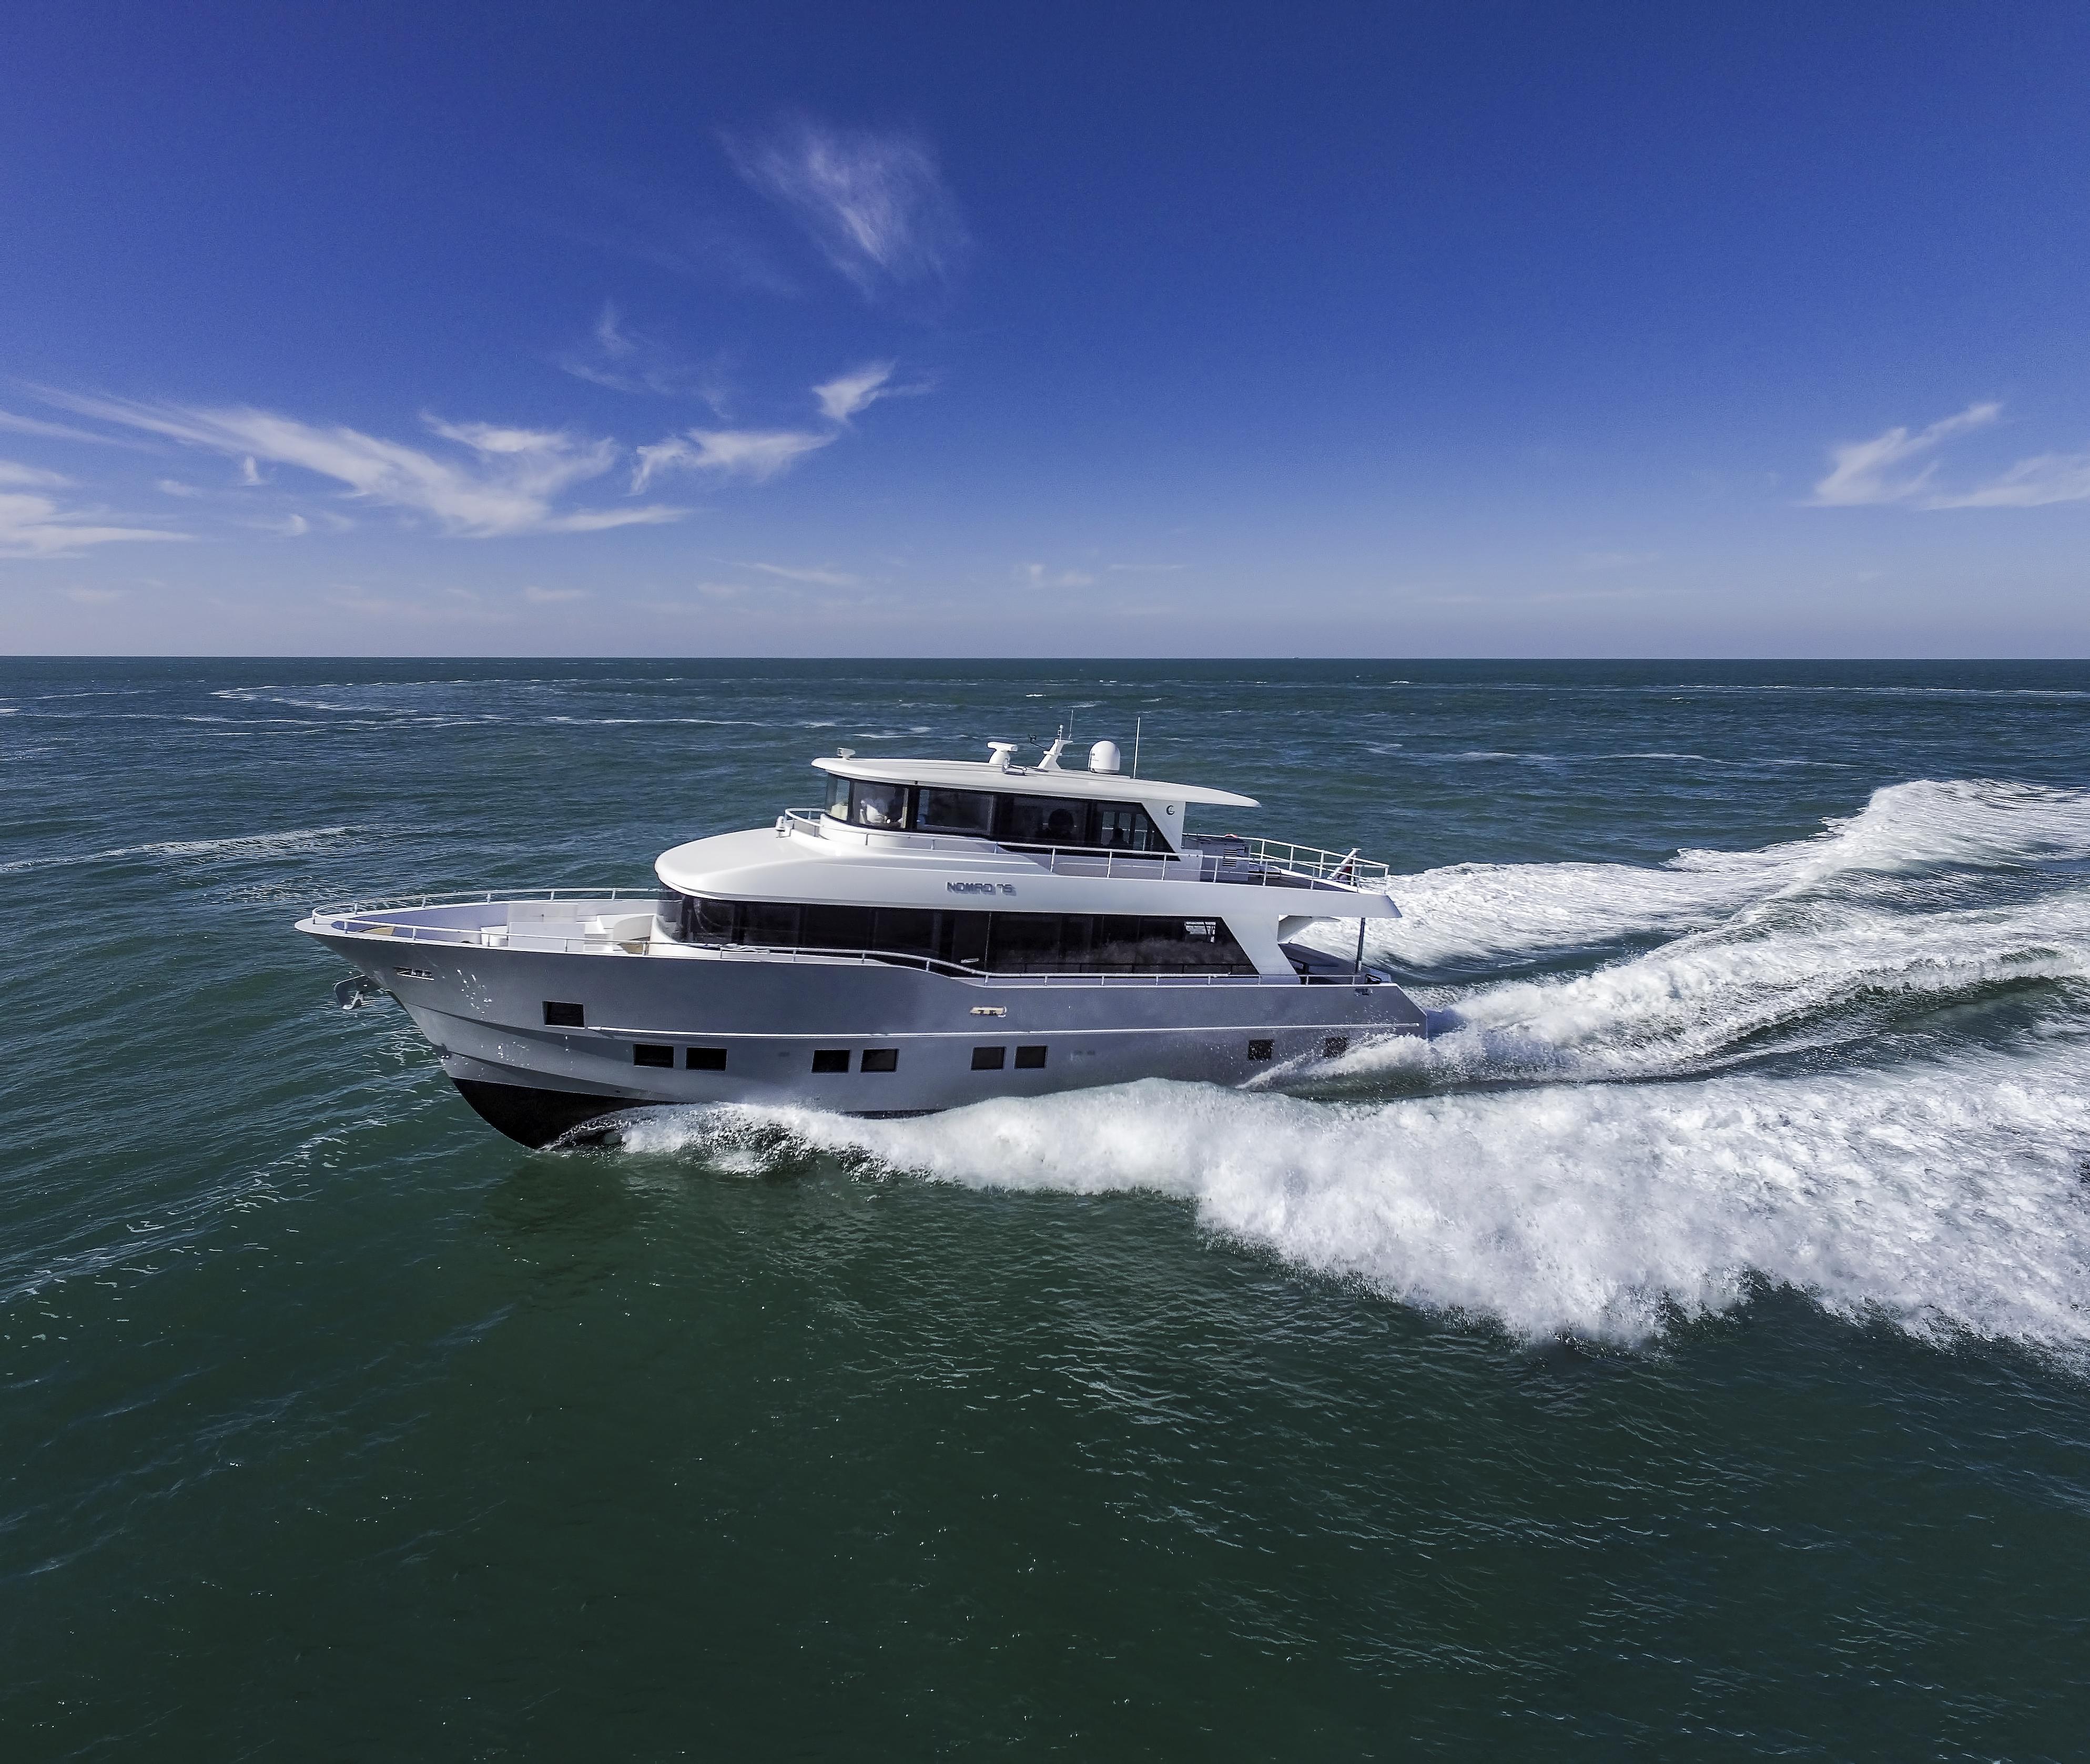 Gulf Craft | Luxury Yachts & Boat Manufacturer in Dubai, UAE